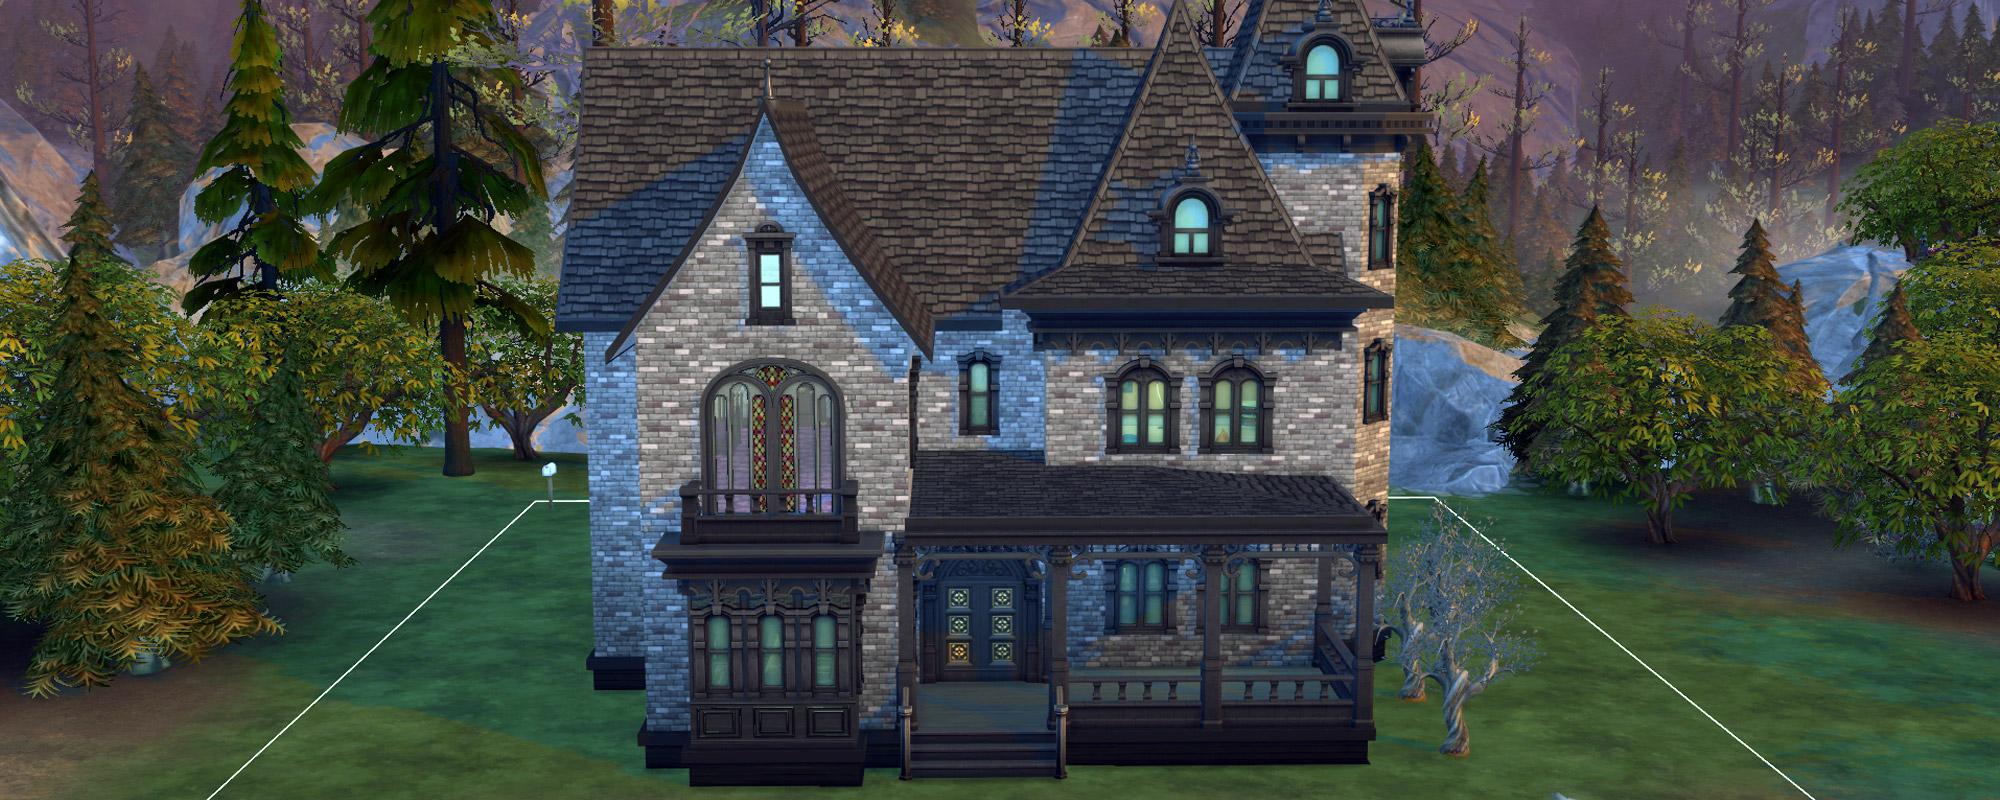 Sims 4 the haunted halls of drakenhof manor - 3 4